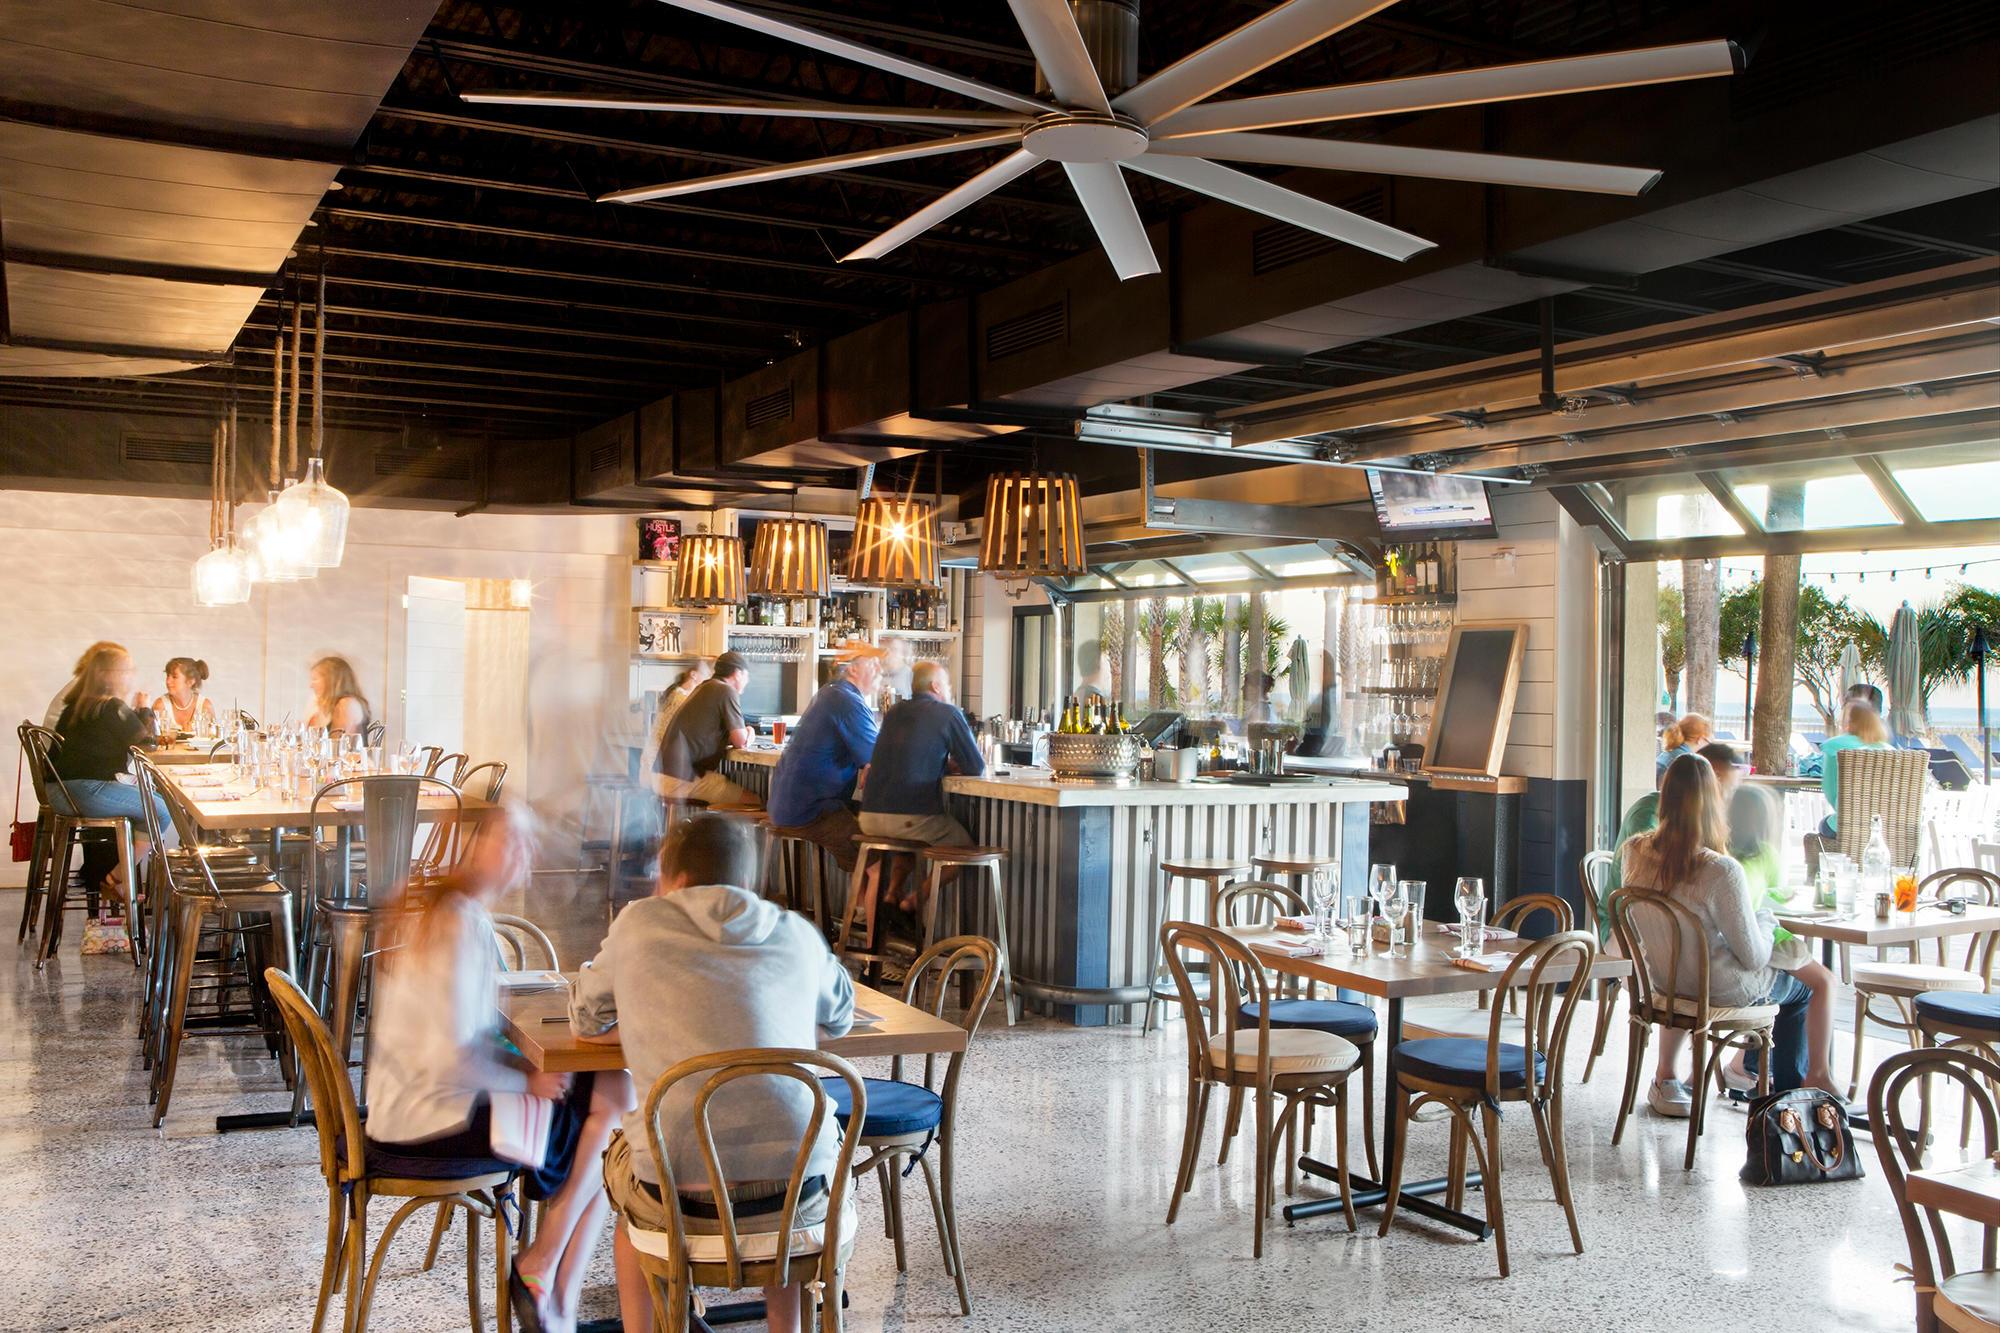 The Porch Southern Kitchen & Bar image 1